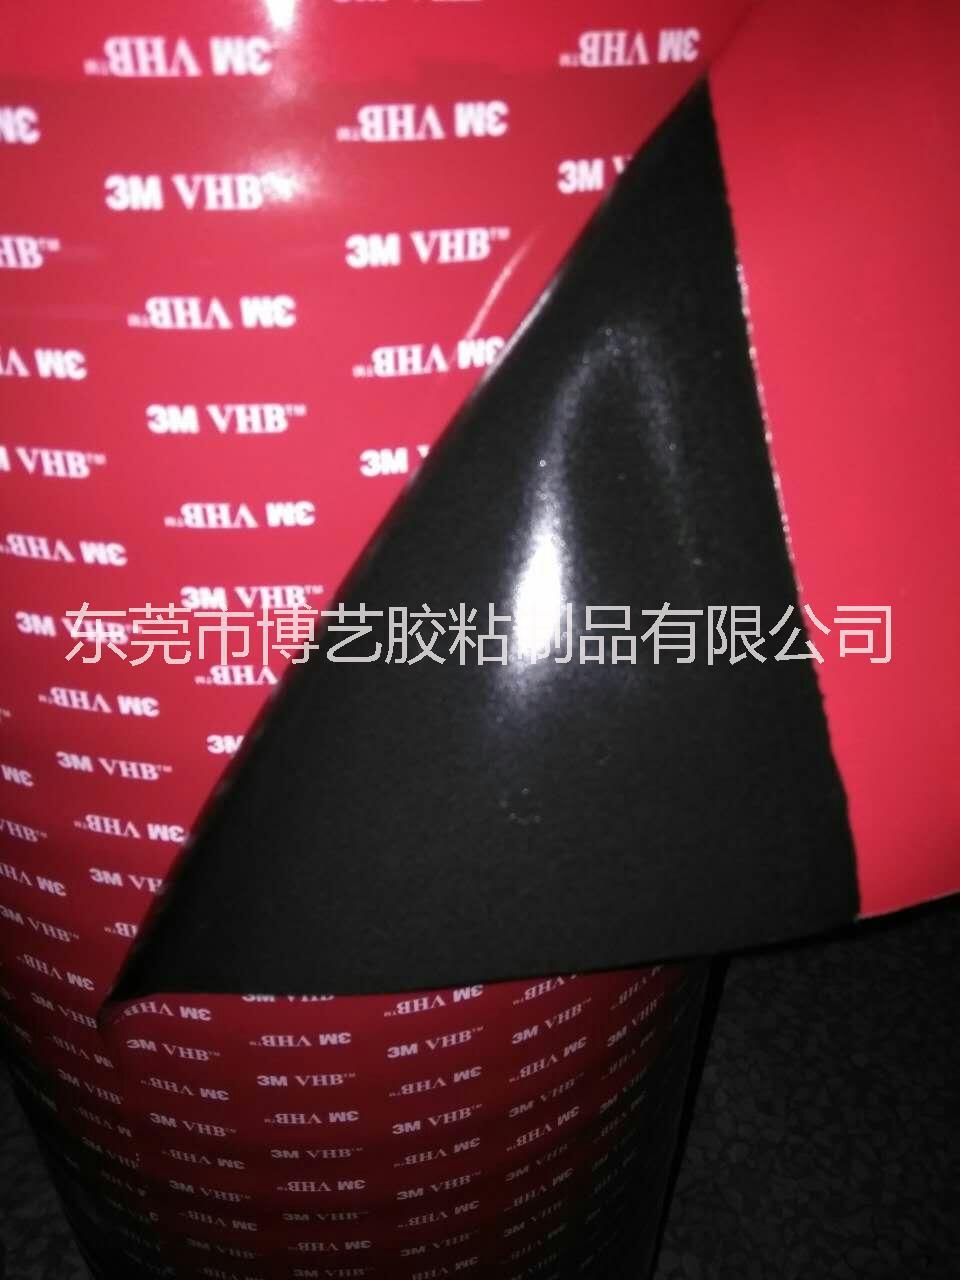 3M5925VHB黑色胶图片/3M5925VHB黑色胶样板图 (2)